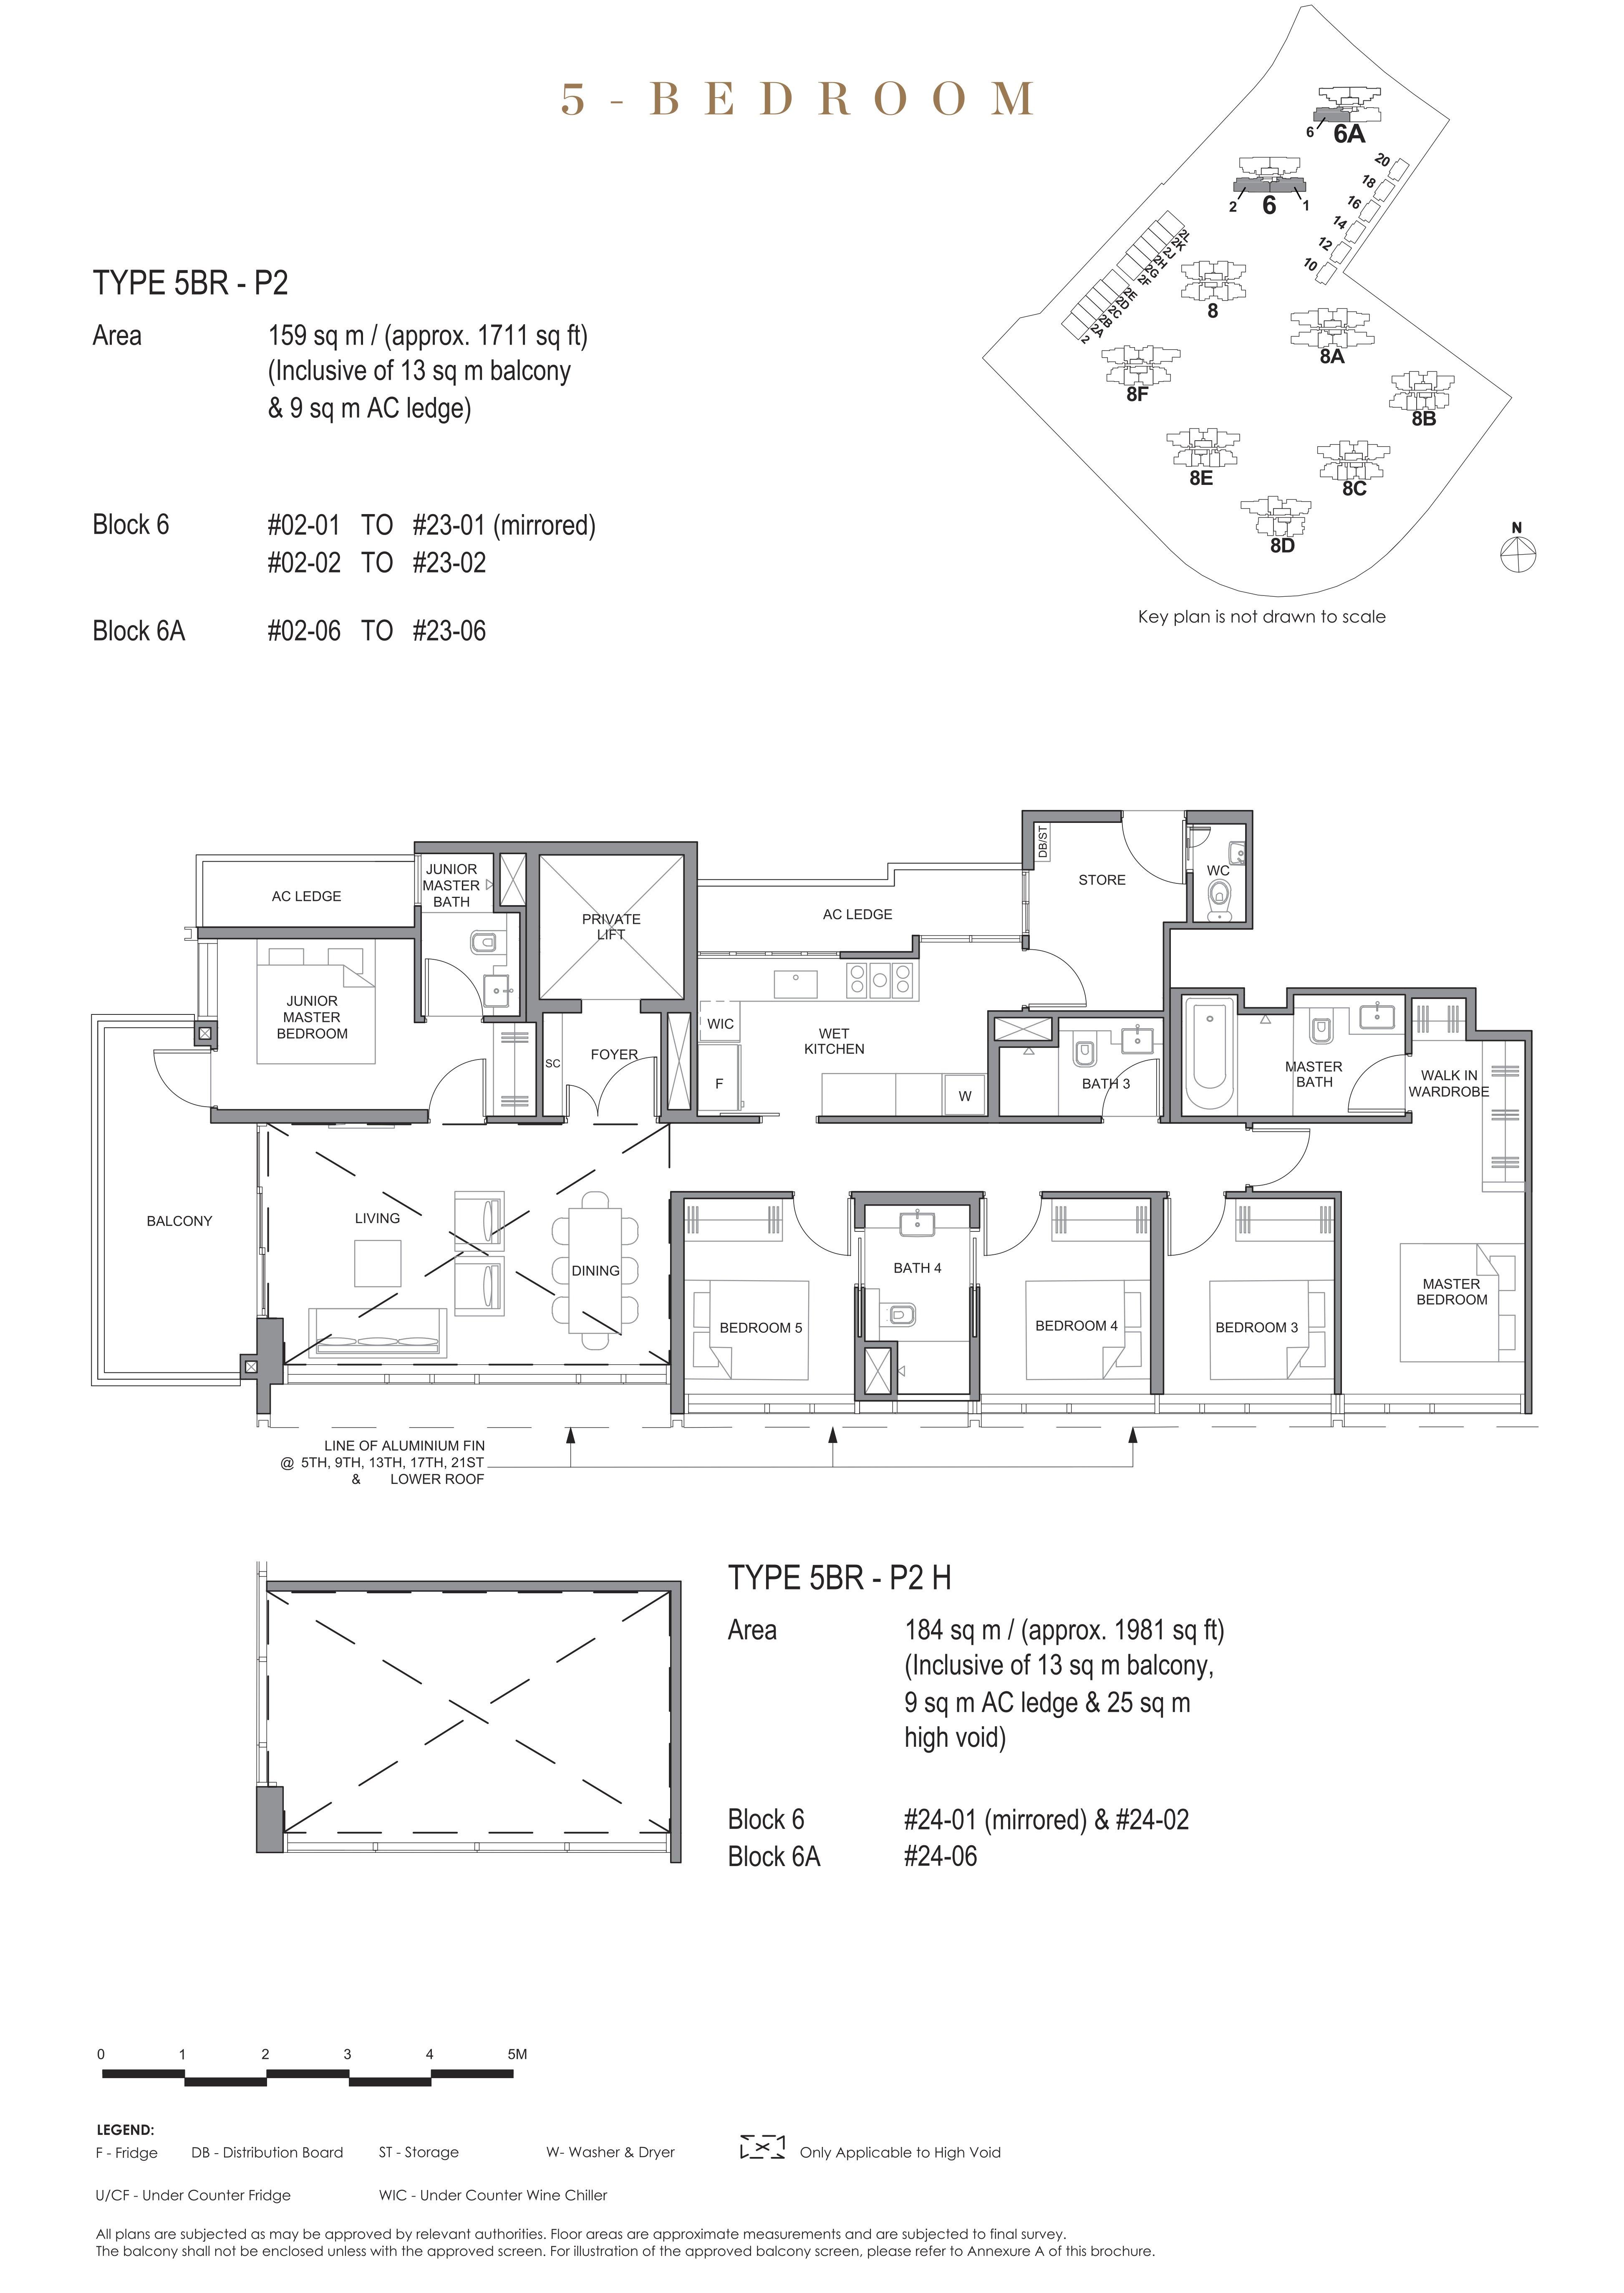 Parc Clematis 锦泰门第 signature 5 bedroom 5卧房 5BR-P2